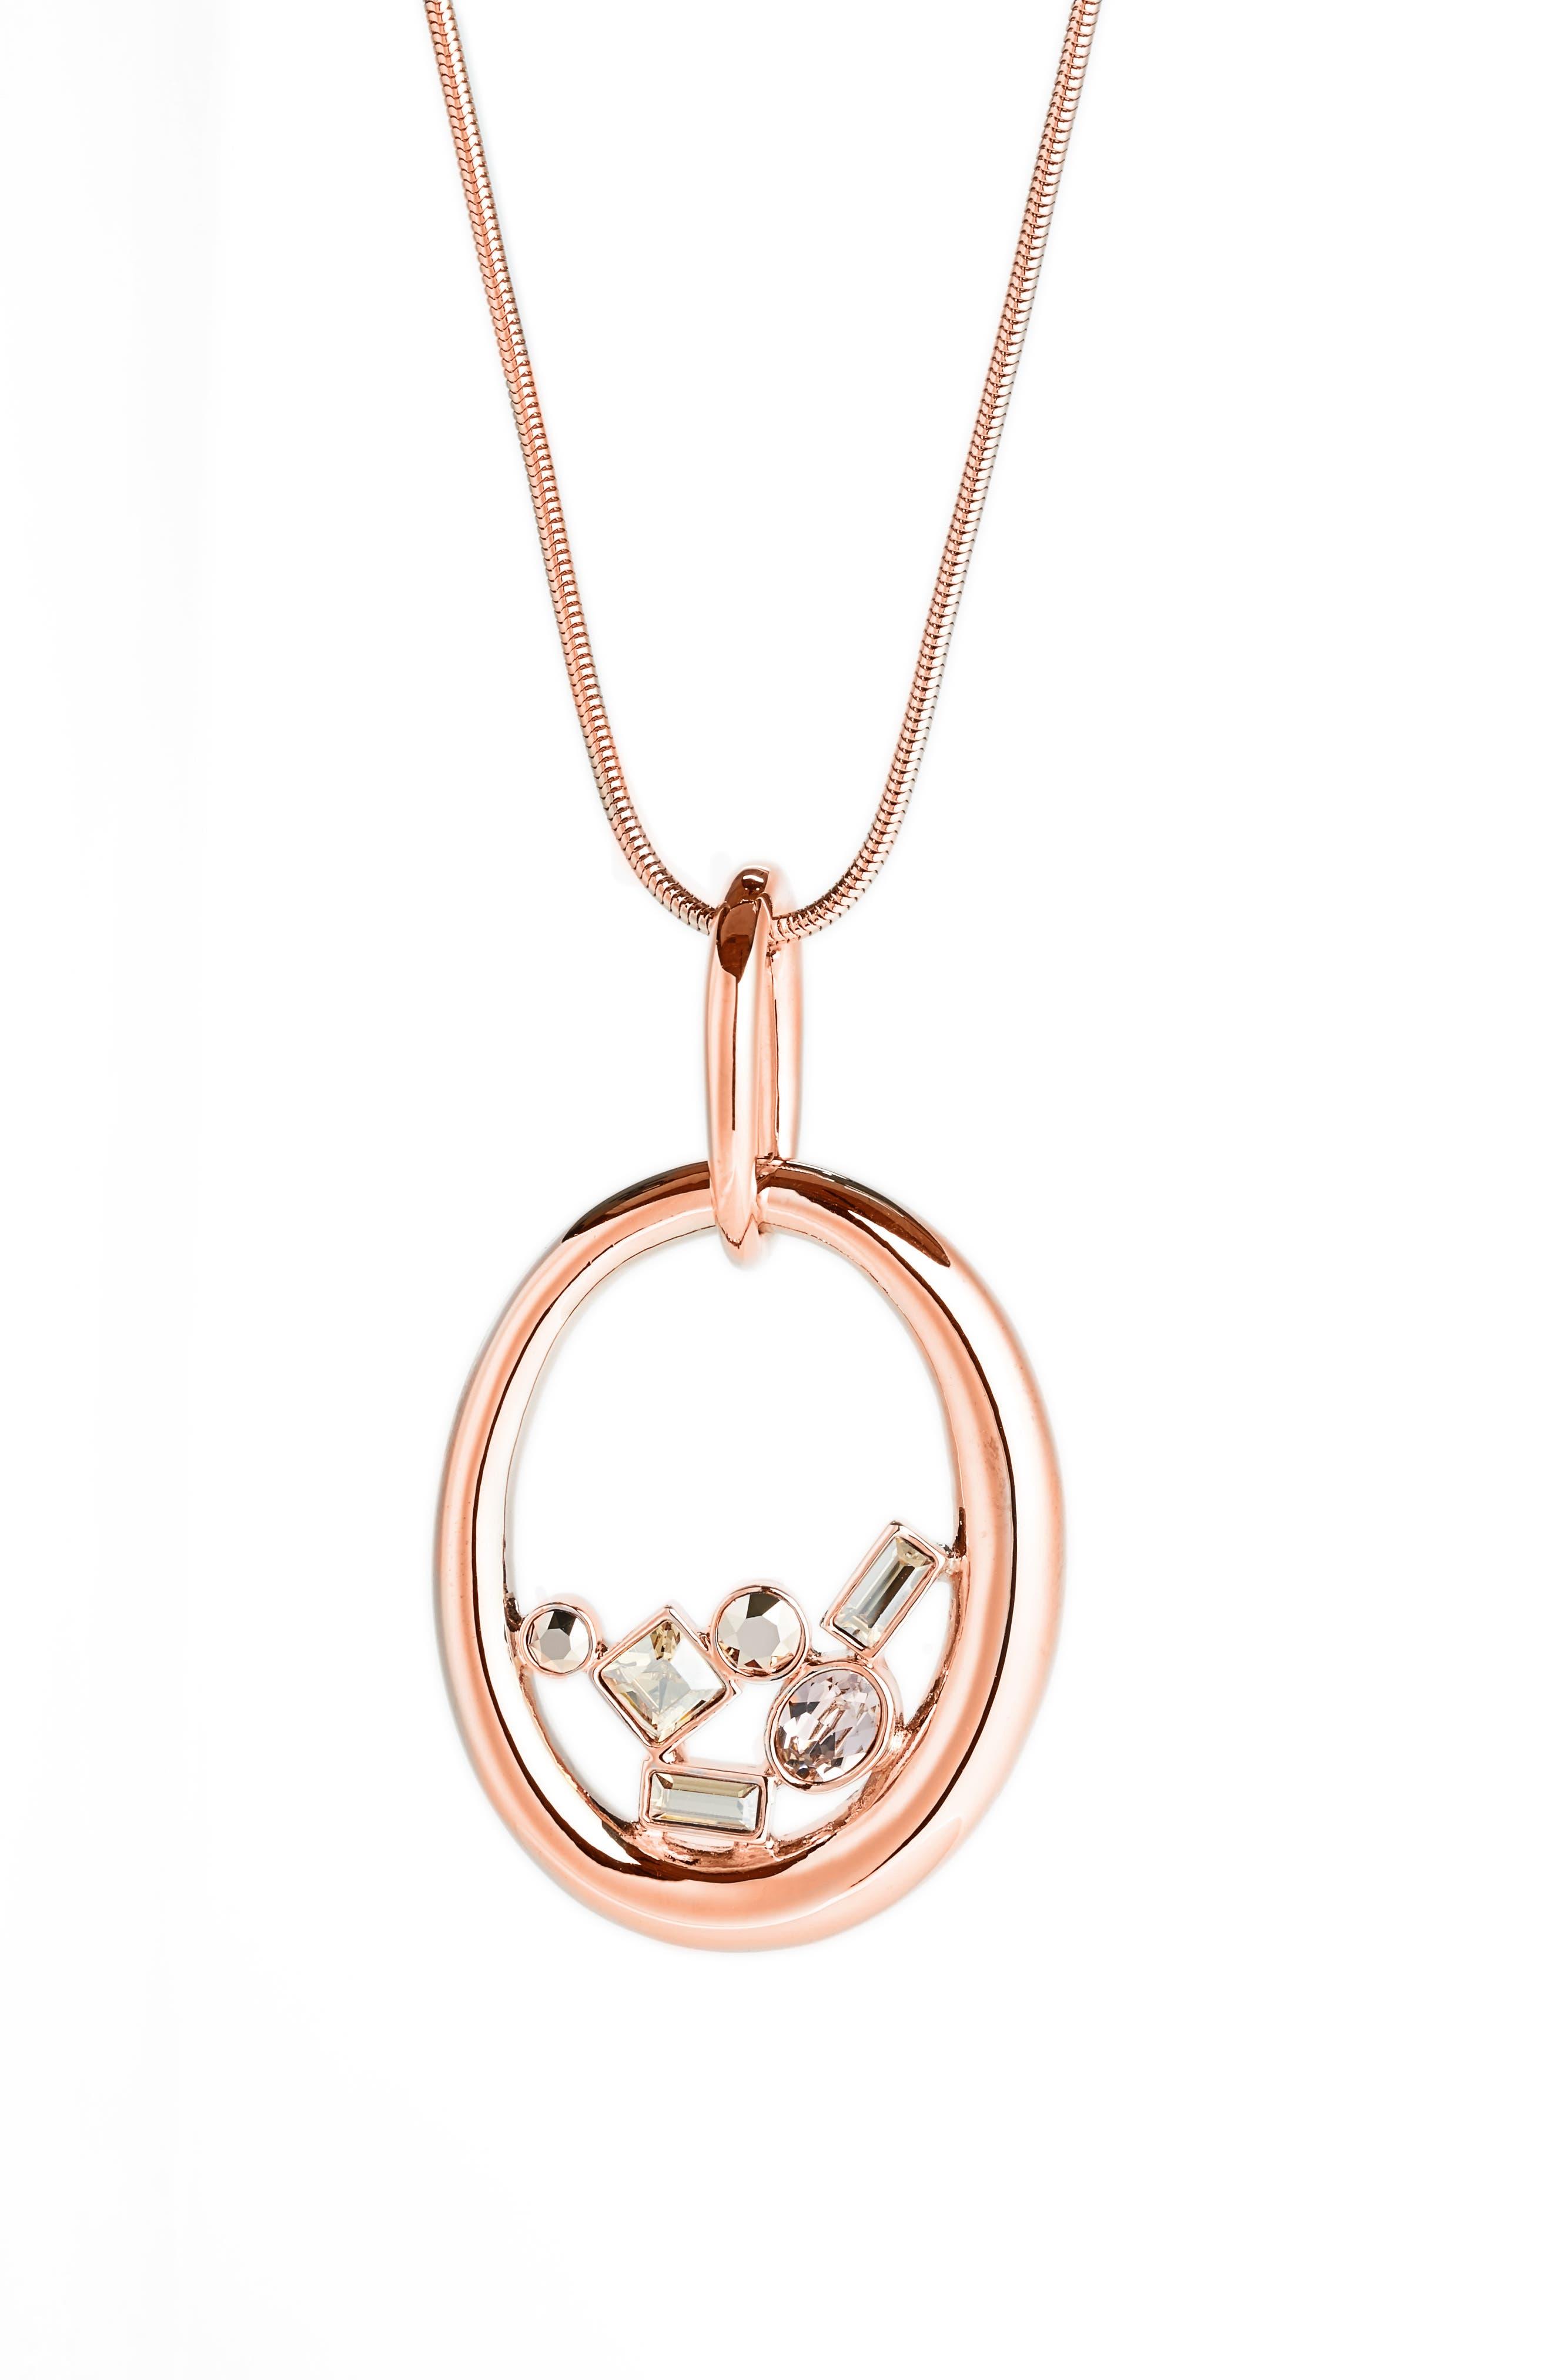 Swarovski Crystal Oval Pendant,                             Main thumbnail 1, color,                             CRYSTAL ROSE GOLD/ ROSE